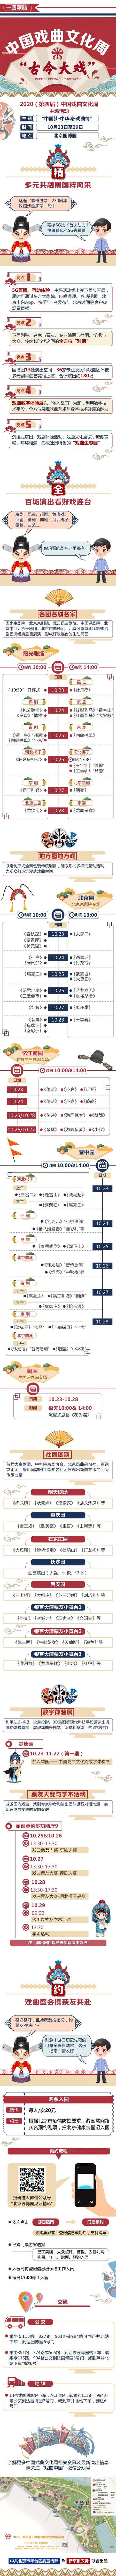 5G版中国戏曲文化周首秀亮相园博园,看古今碰撞出哪些奇妙火花图片